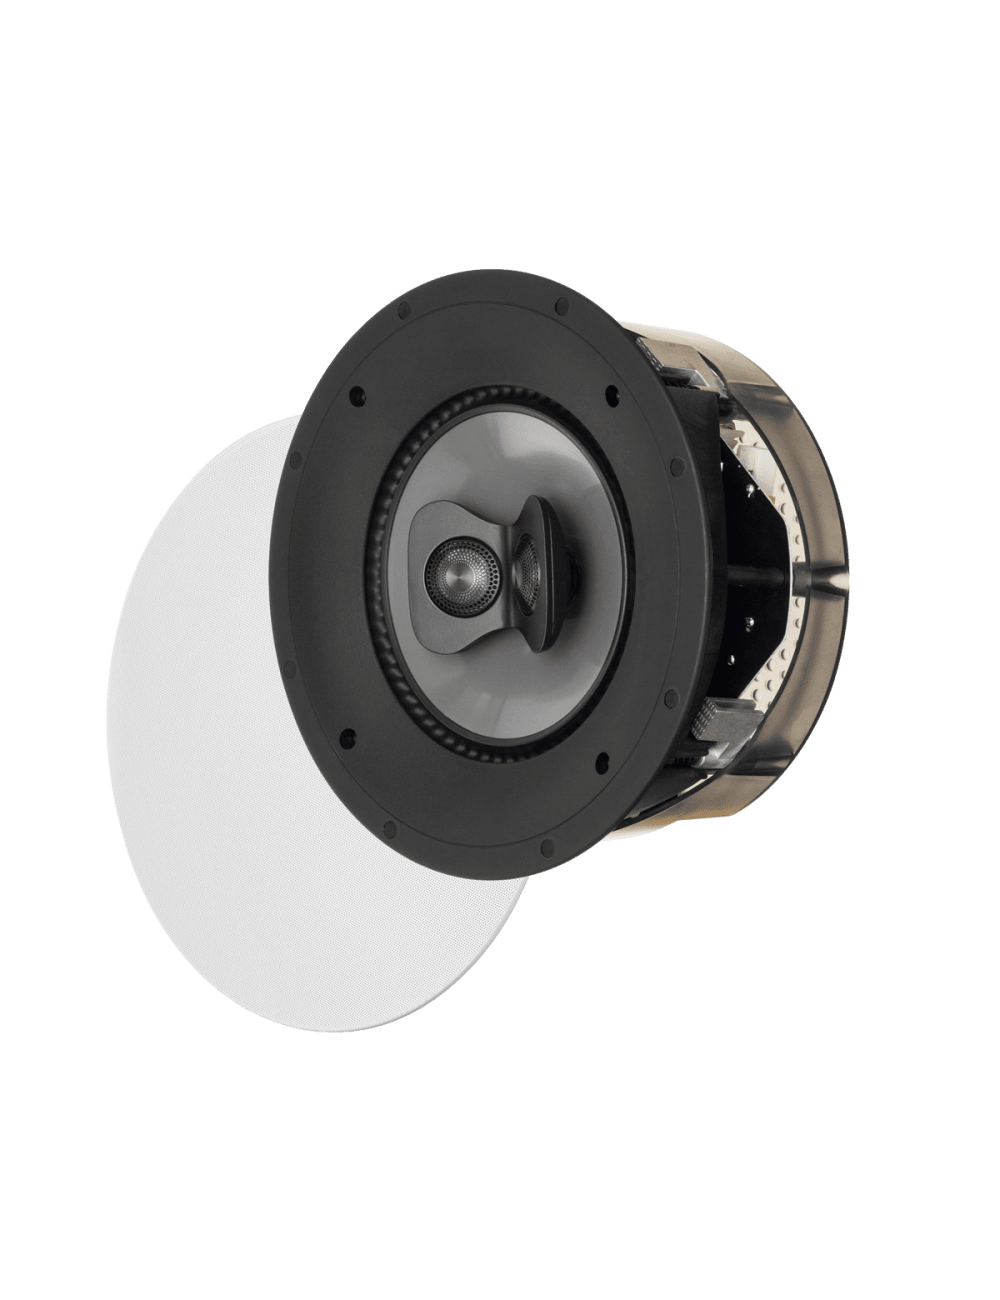 diffusore acustico da incasso a parete o a soffitto, Paradigm CI PRO P80-SM, griglia rotonda